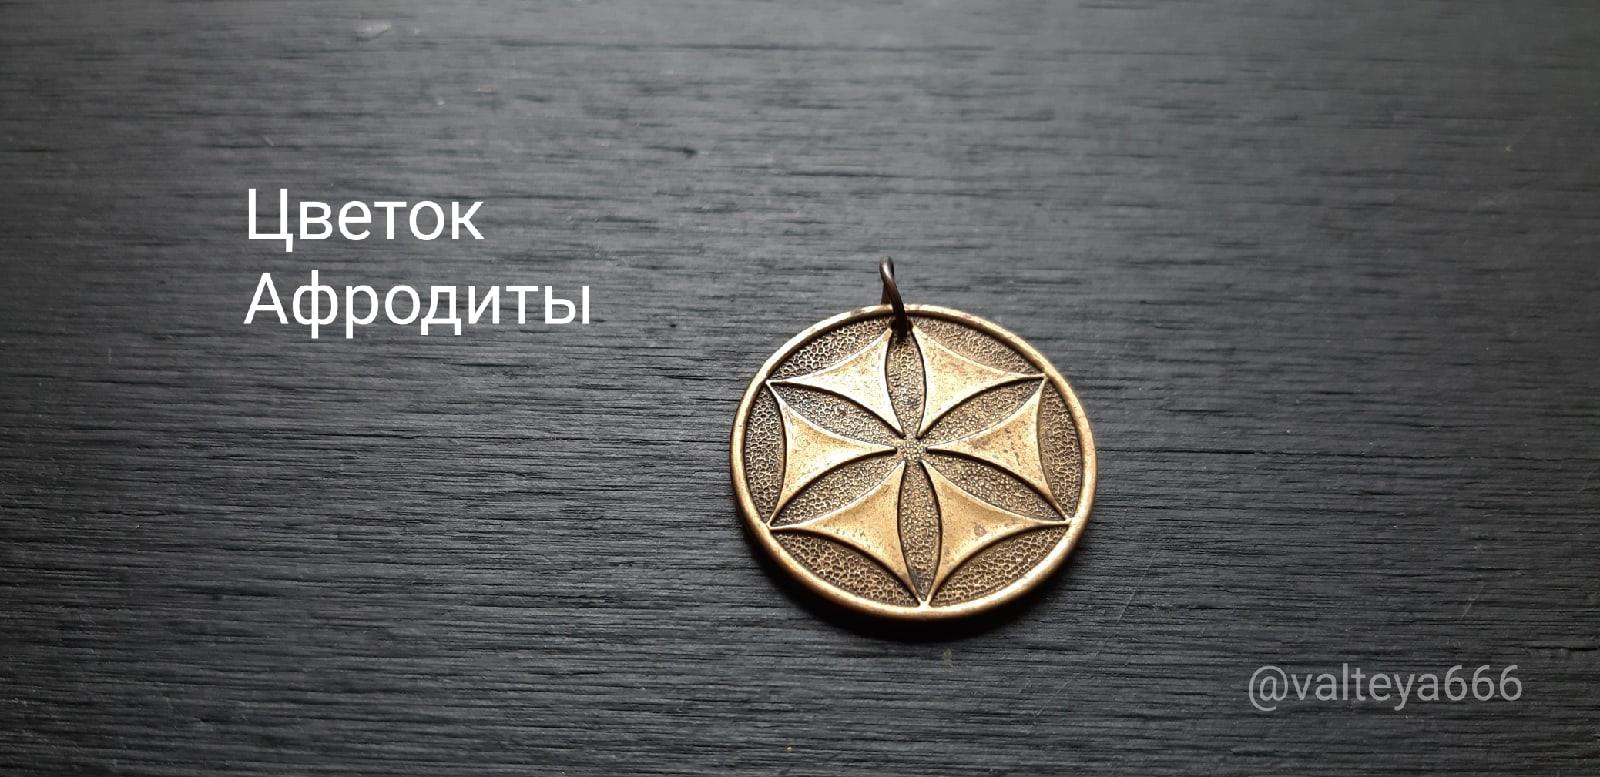 киев - Амулеты, талисманы, обереги из металла. - Страница 2 PZBABlM9kVg